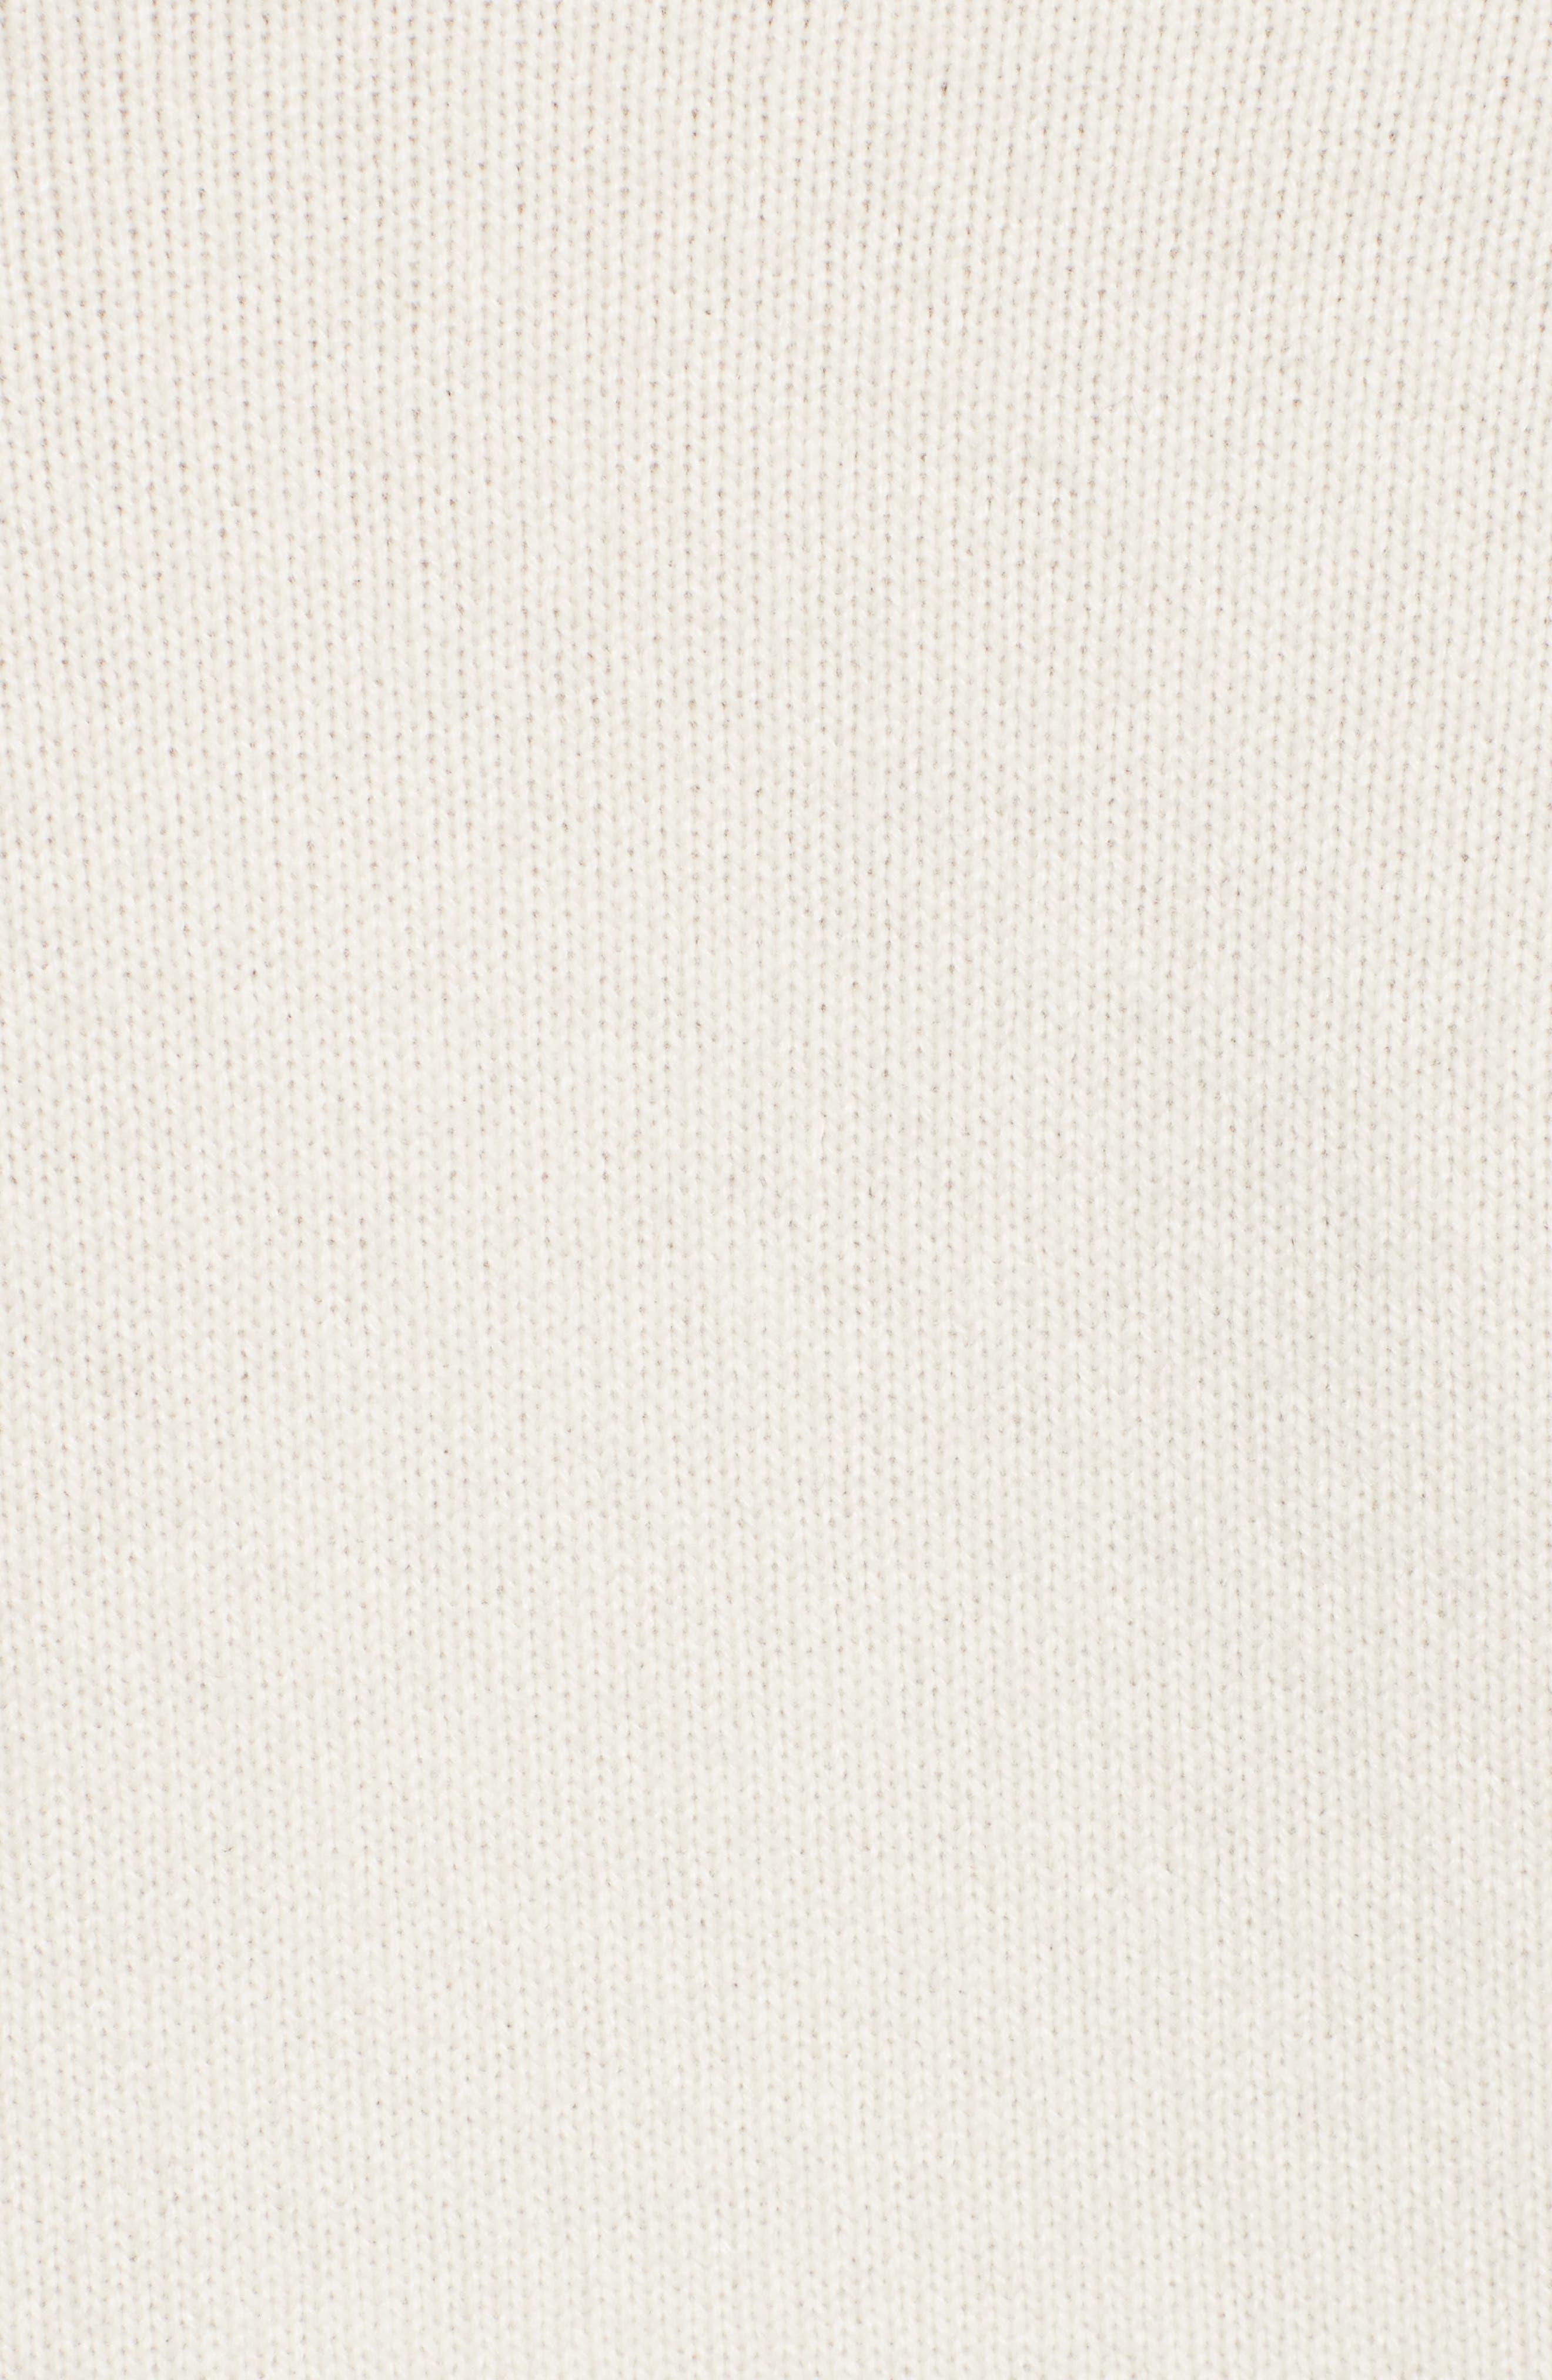 VICTORIA BECKHAM, Cashmere Turtleneck Sweater, Alternate thumbnail 5, color, VANILLA